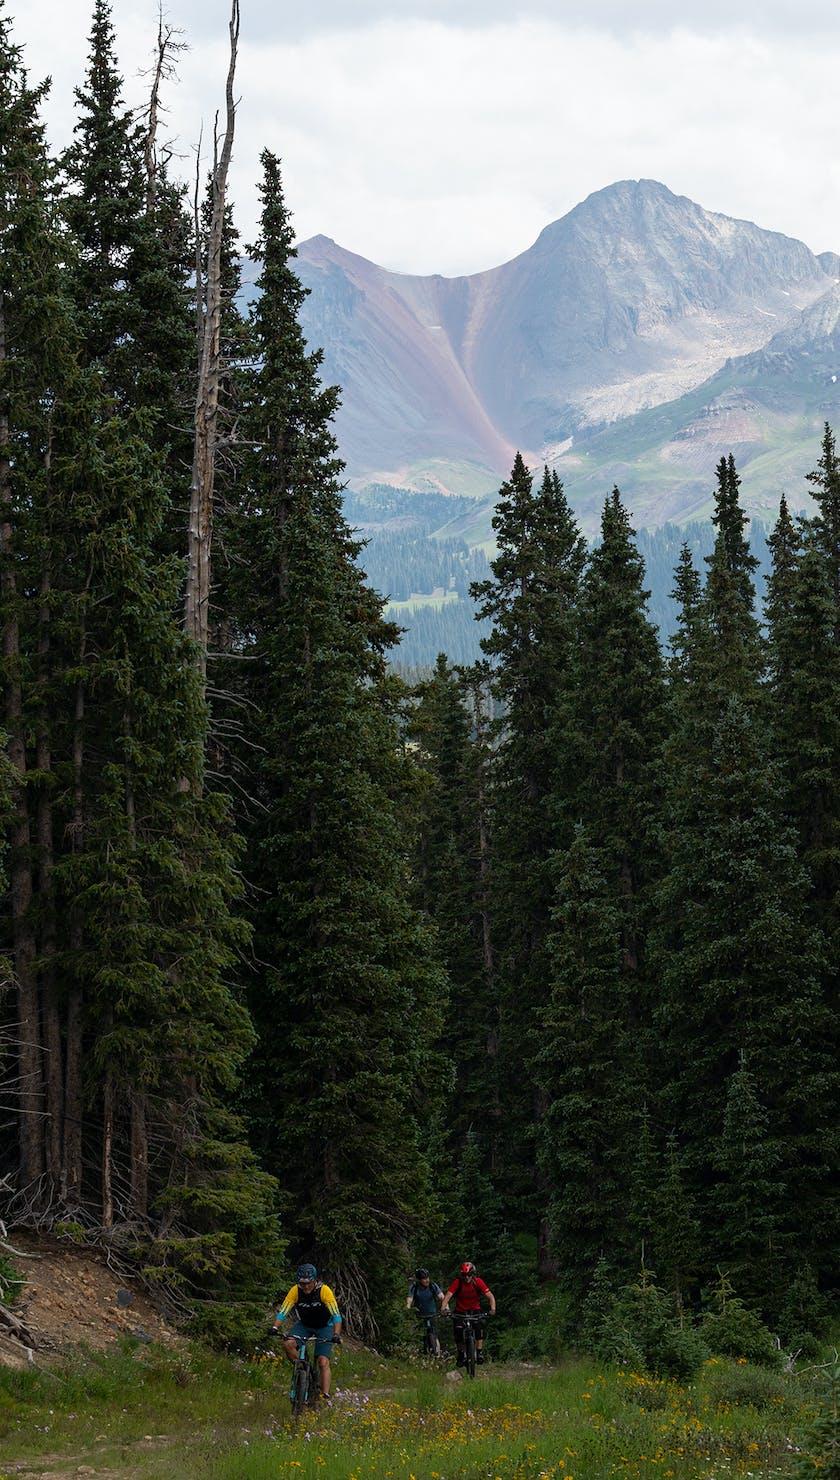 Durango Gathering 21 - The Climb Continues